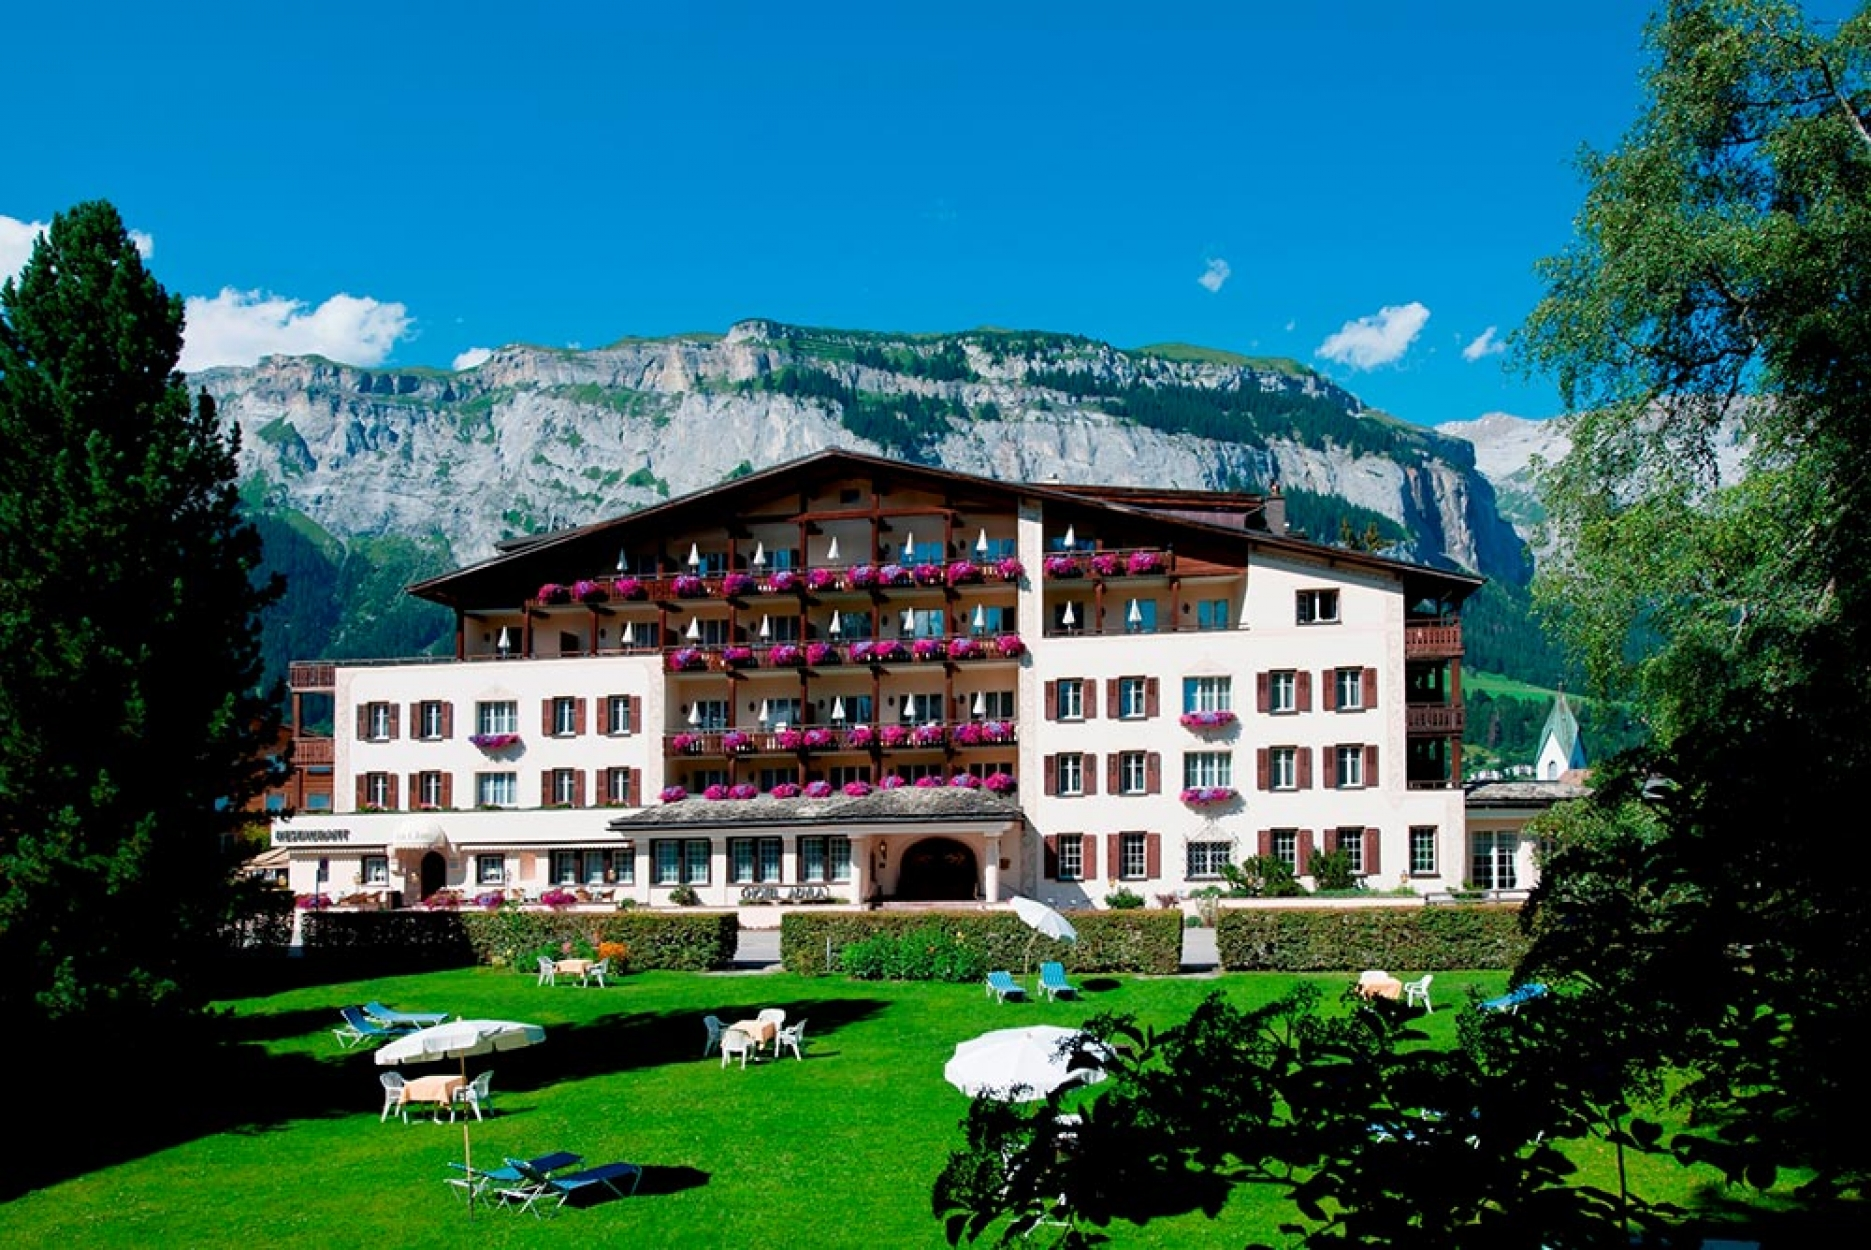 Hotel Adula Flims